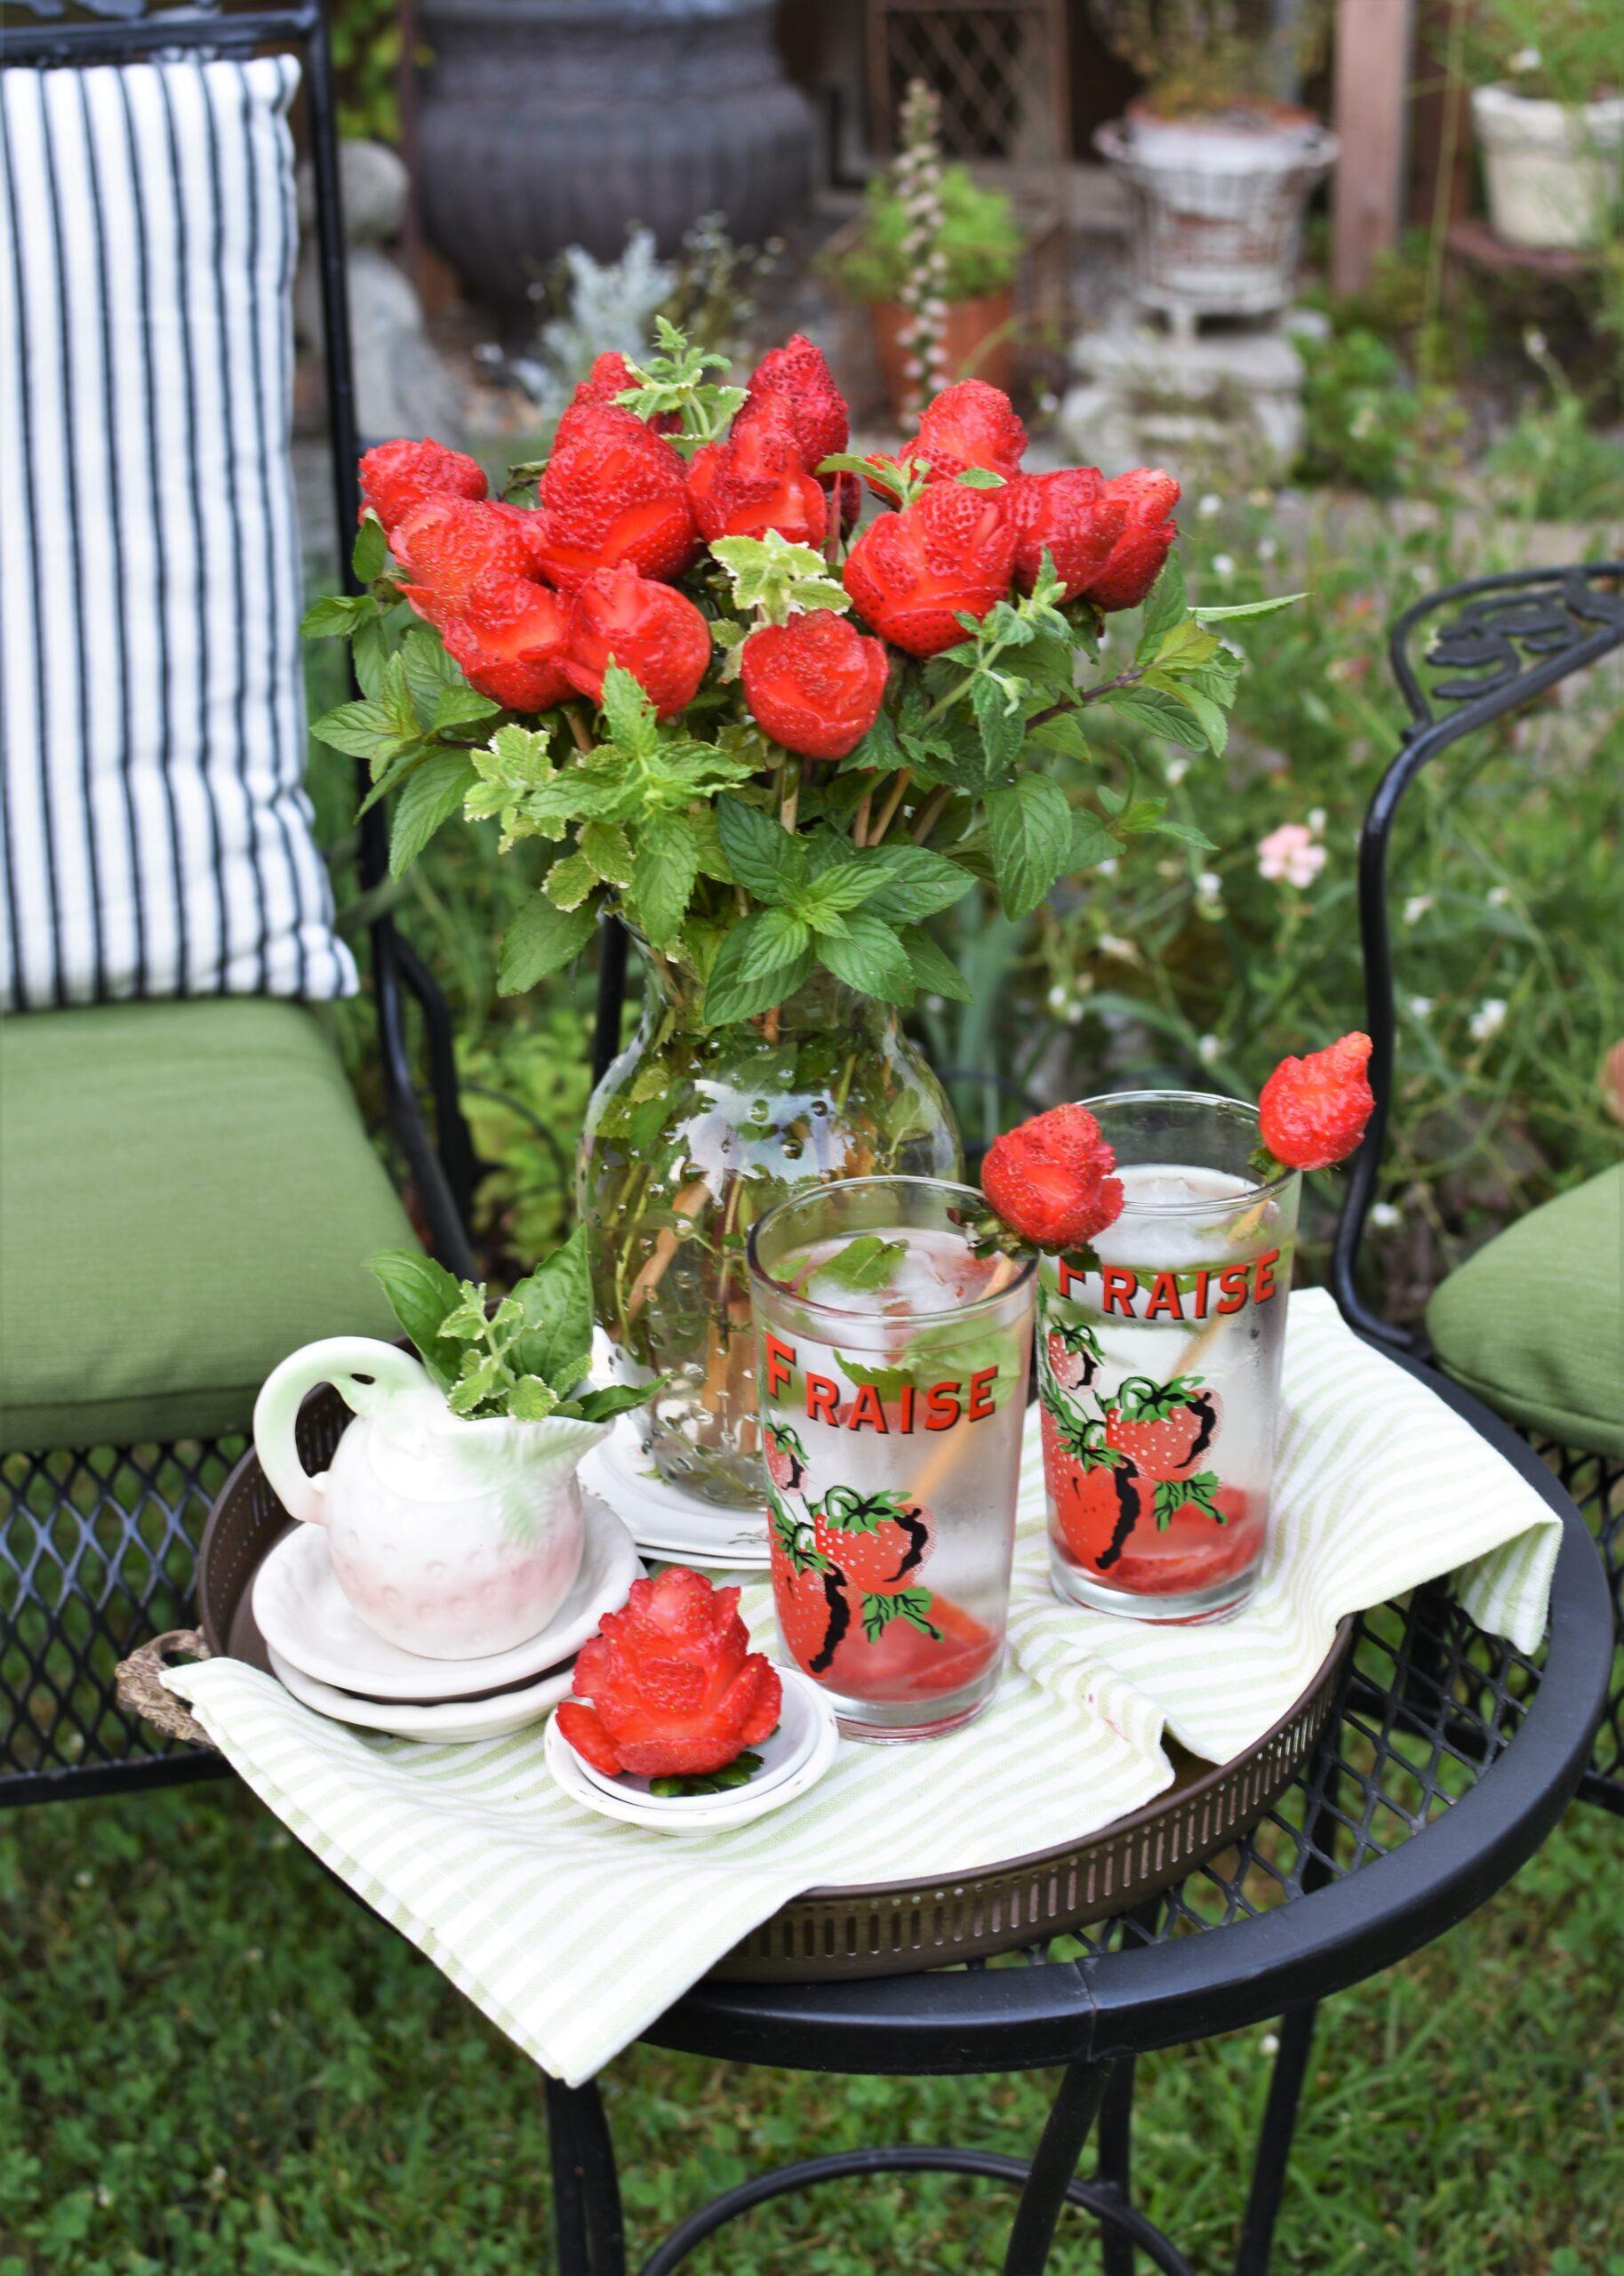 Edible Strawberry Roses bouquet elegant summer picnic strawberry picnic stawberry decor